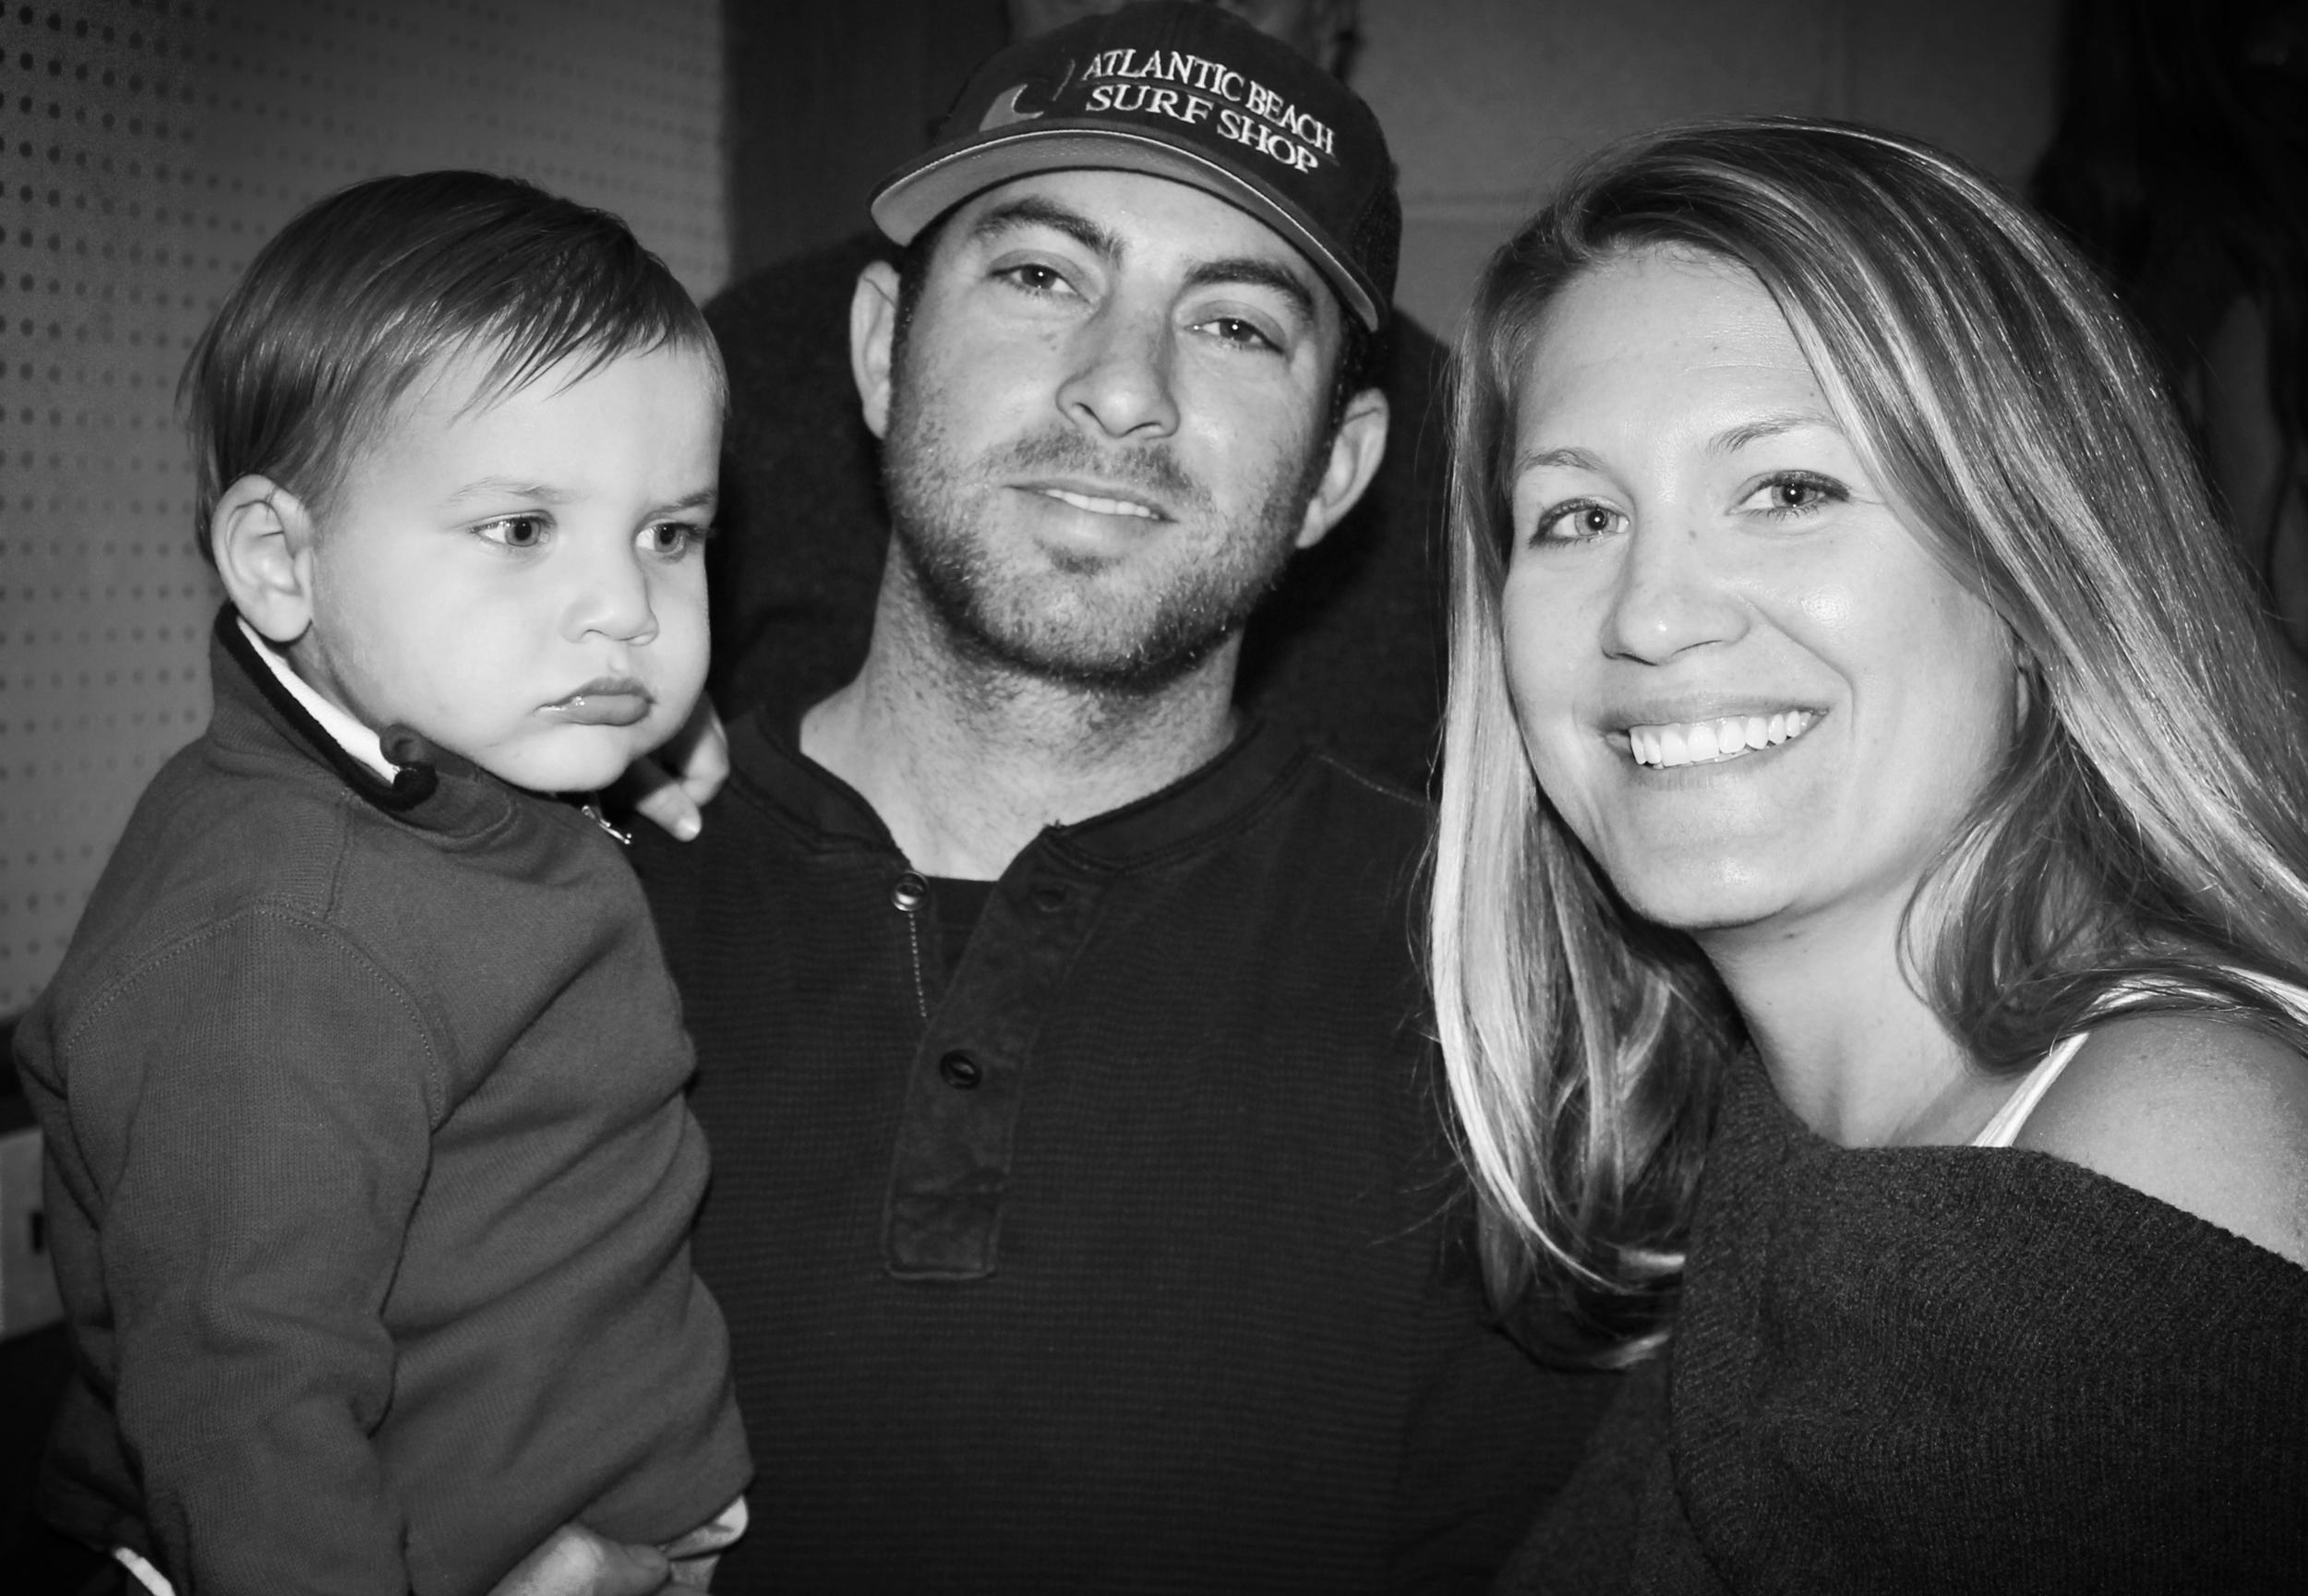 Joseph, his wife Marissa, and son Logan